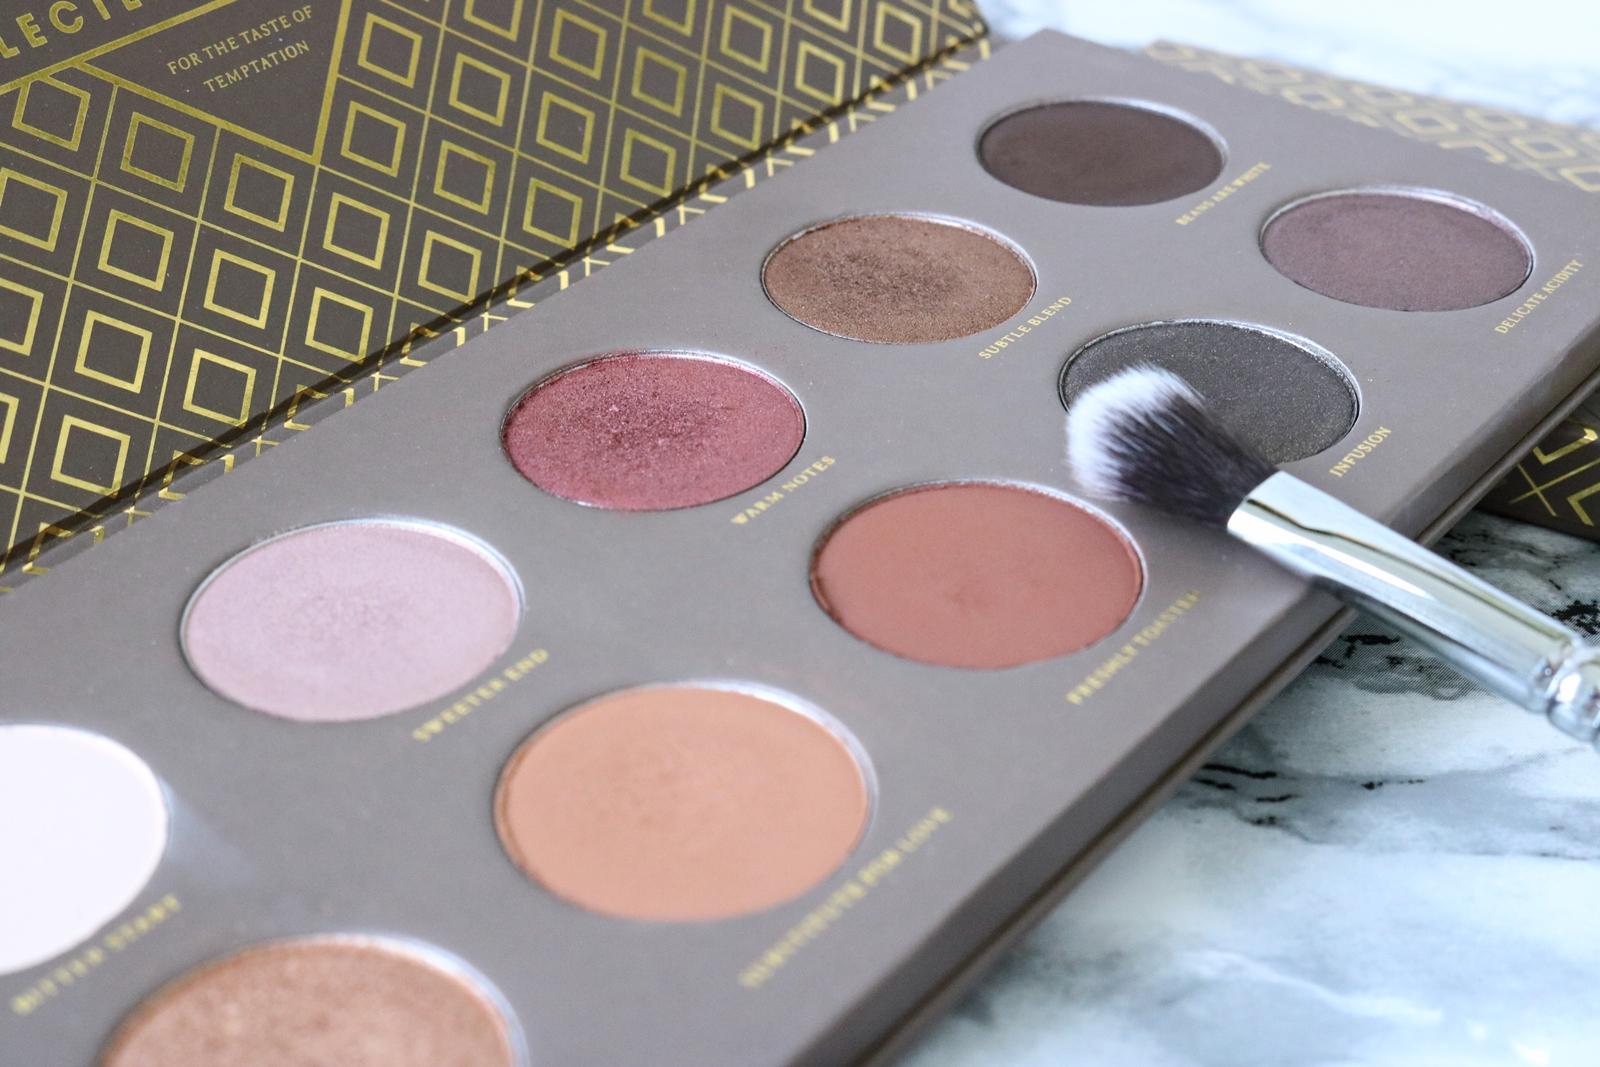 Zoeva Cocoa Blend Palette - Lidschattenpalette - Gewinnspiel - Fashionladyloves by Tamara Wagner - Beautyblog